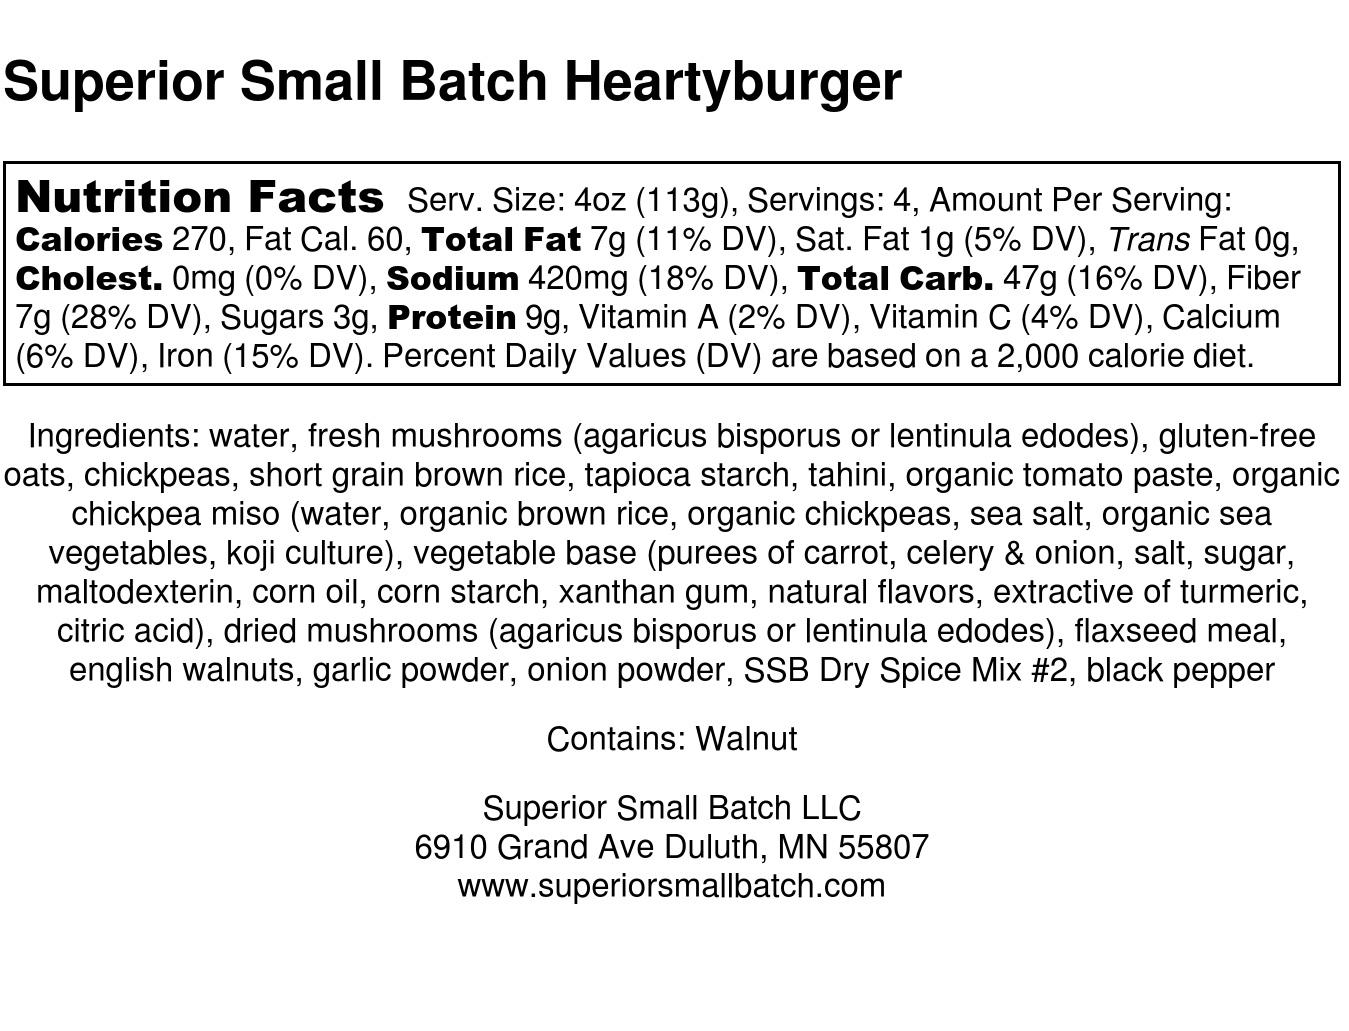 Superior Small Batch Heartyburger Nutrition Label FULL 2.jpg